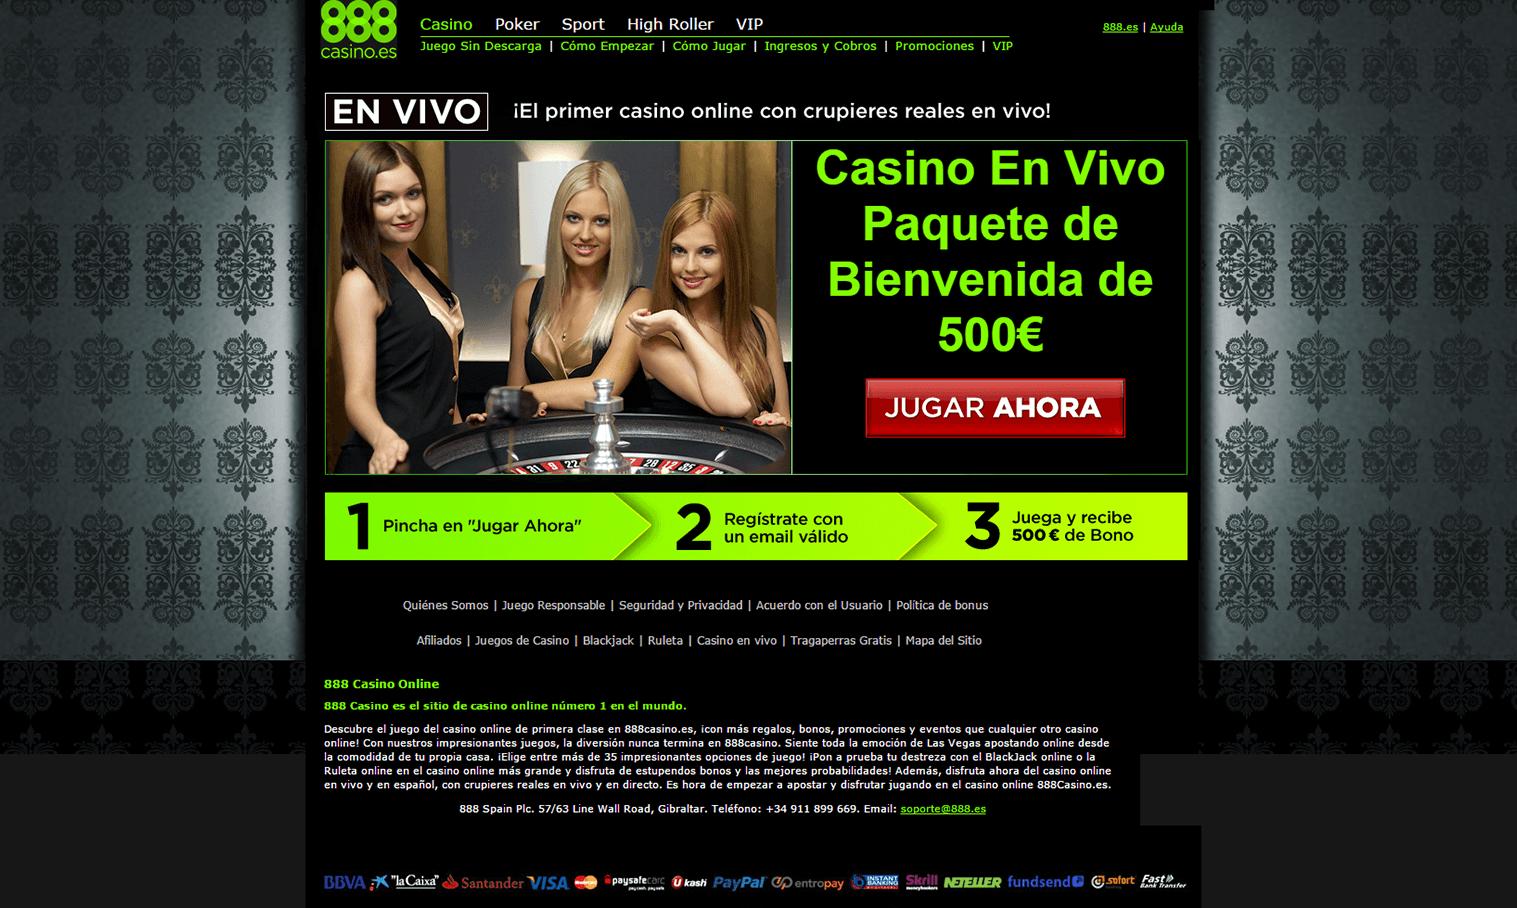 Juegos LotusAsiacasino com 888 casino en vivo-276173